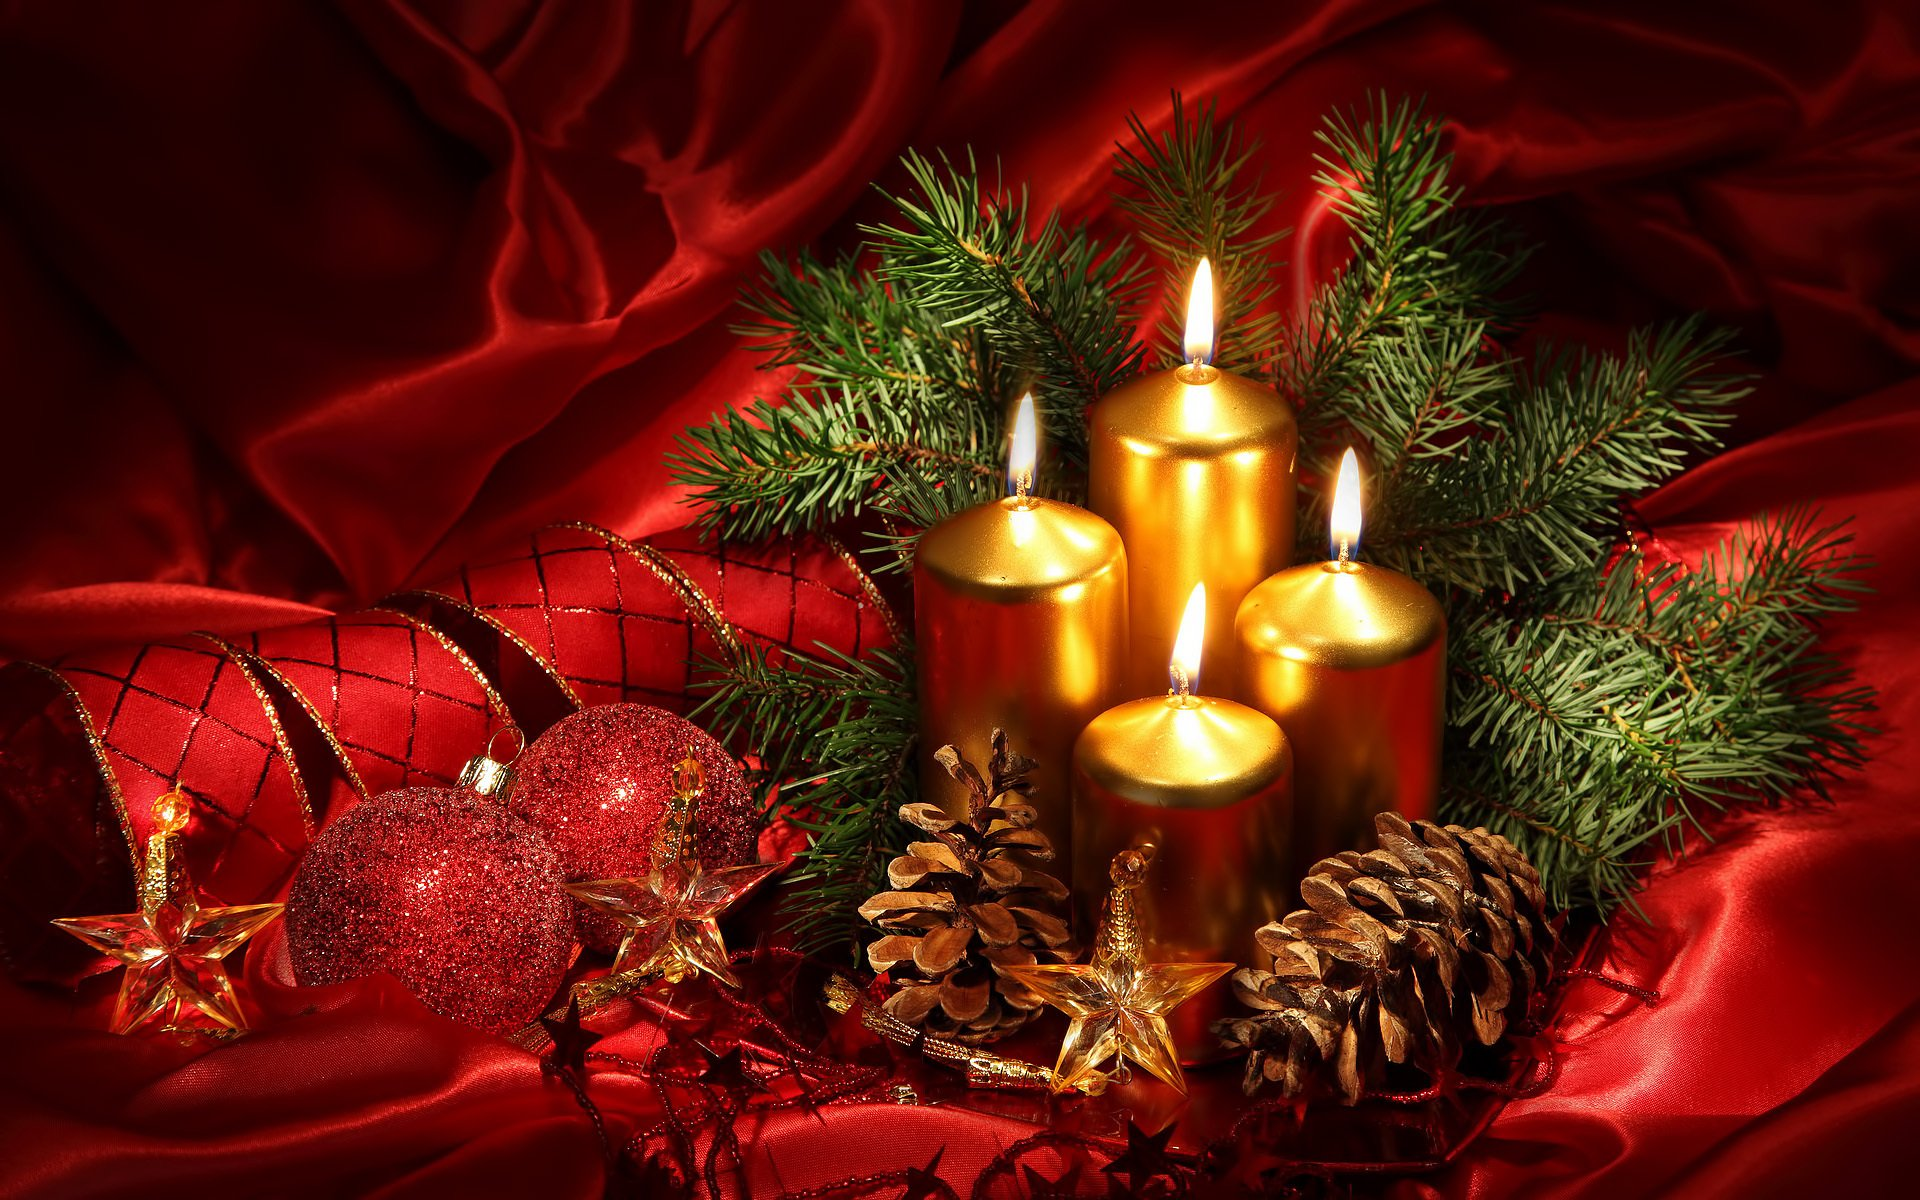 Holiday - Christmas  Holiday Candle Pine Cone Christmas Ornaments Ribbon Red Wallpaper